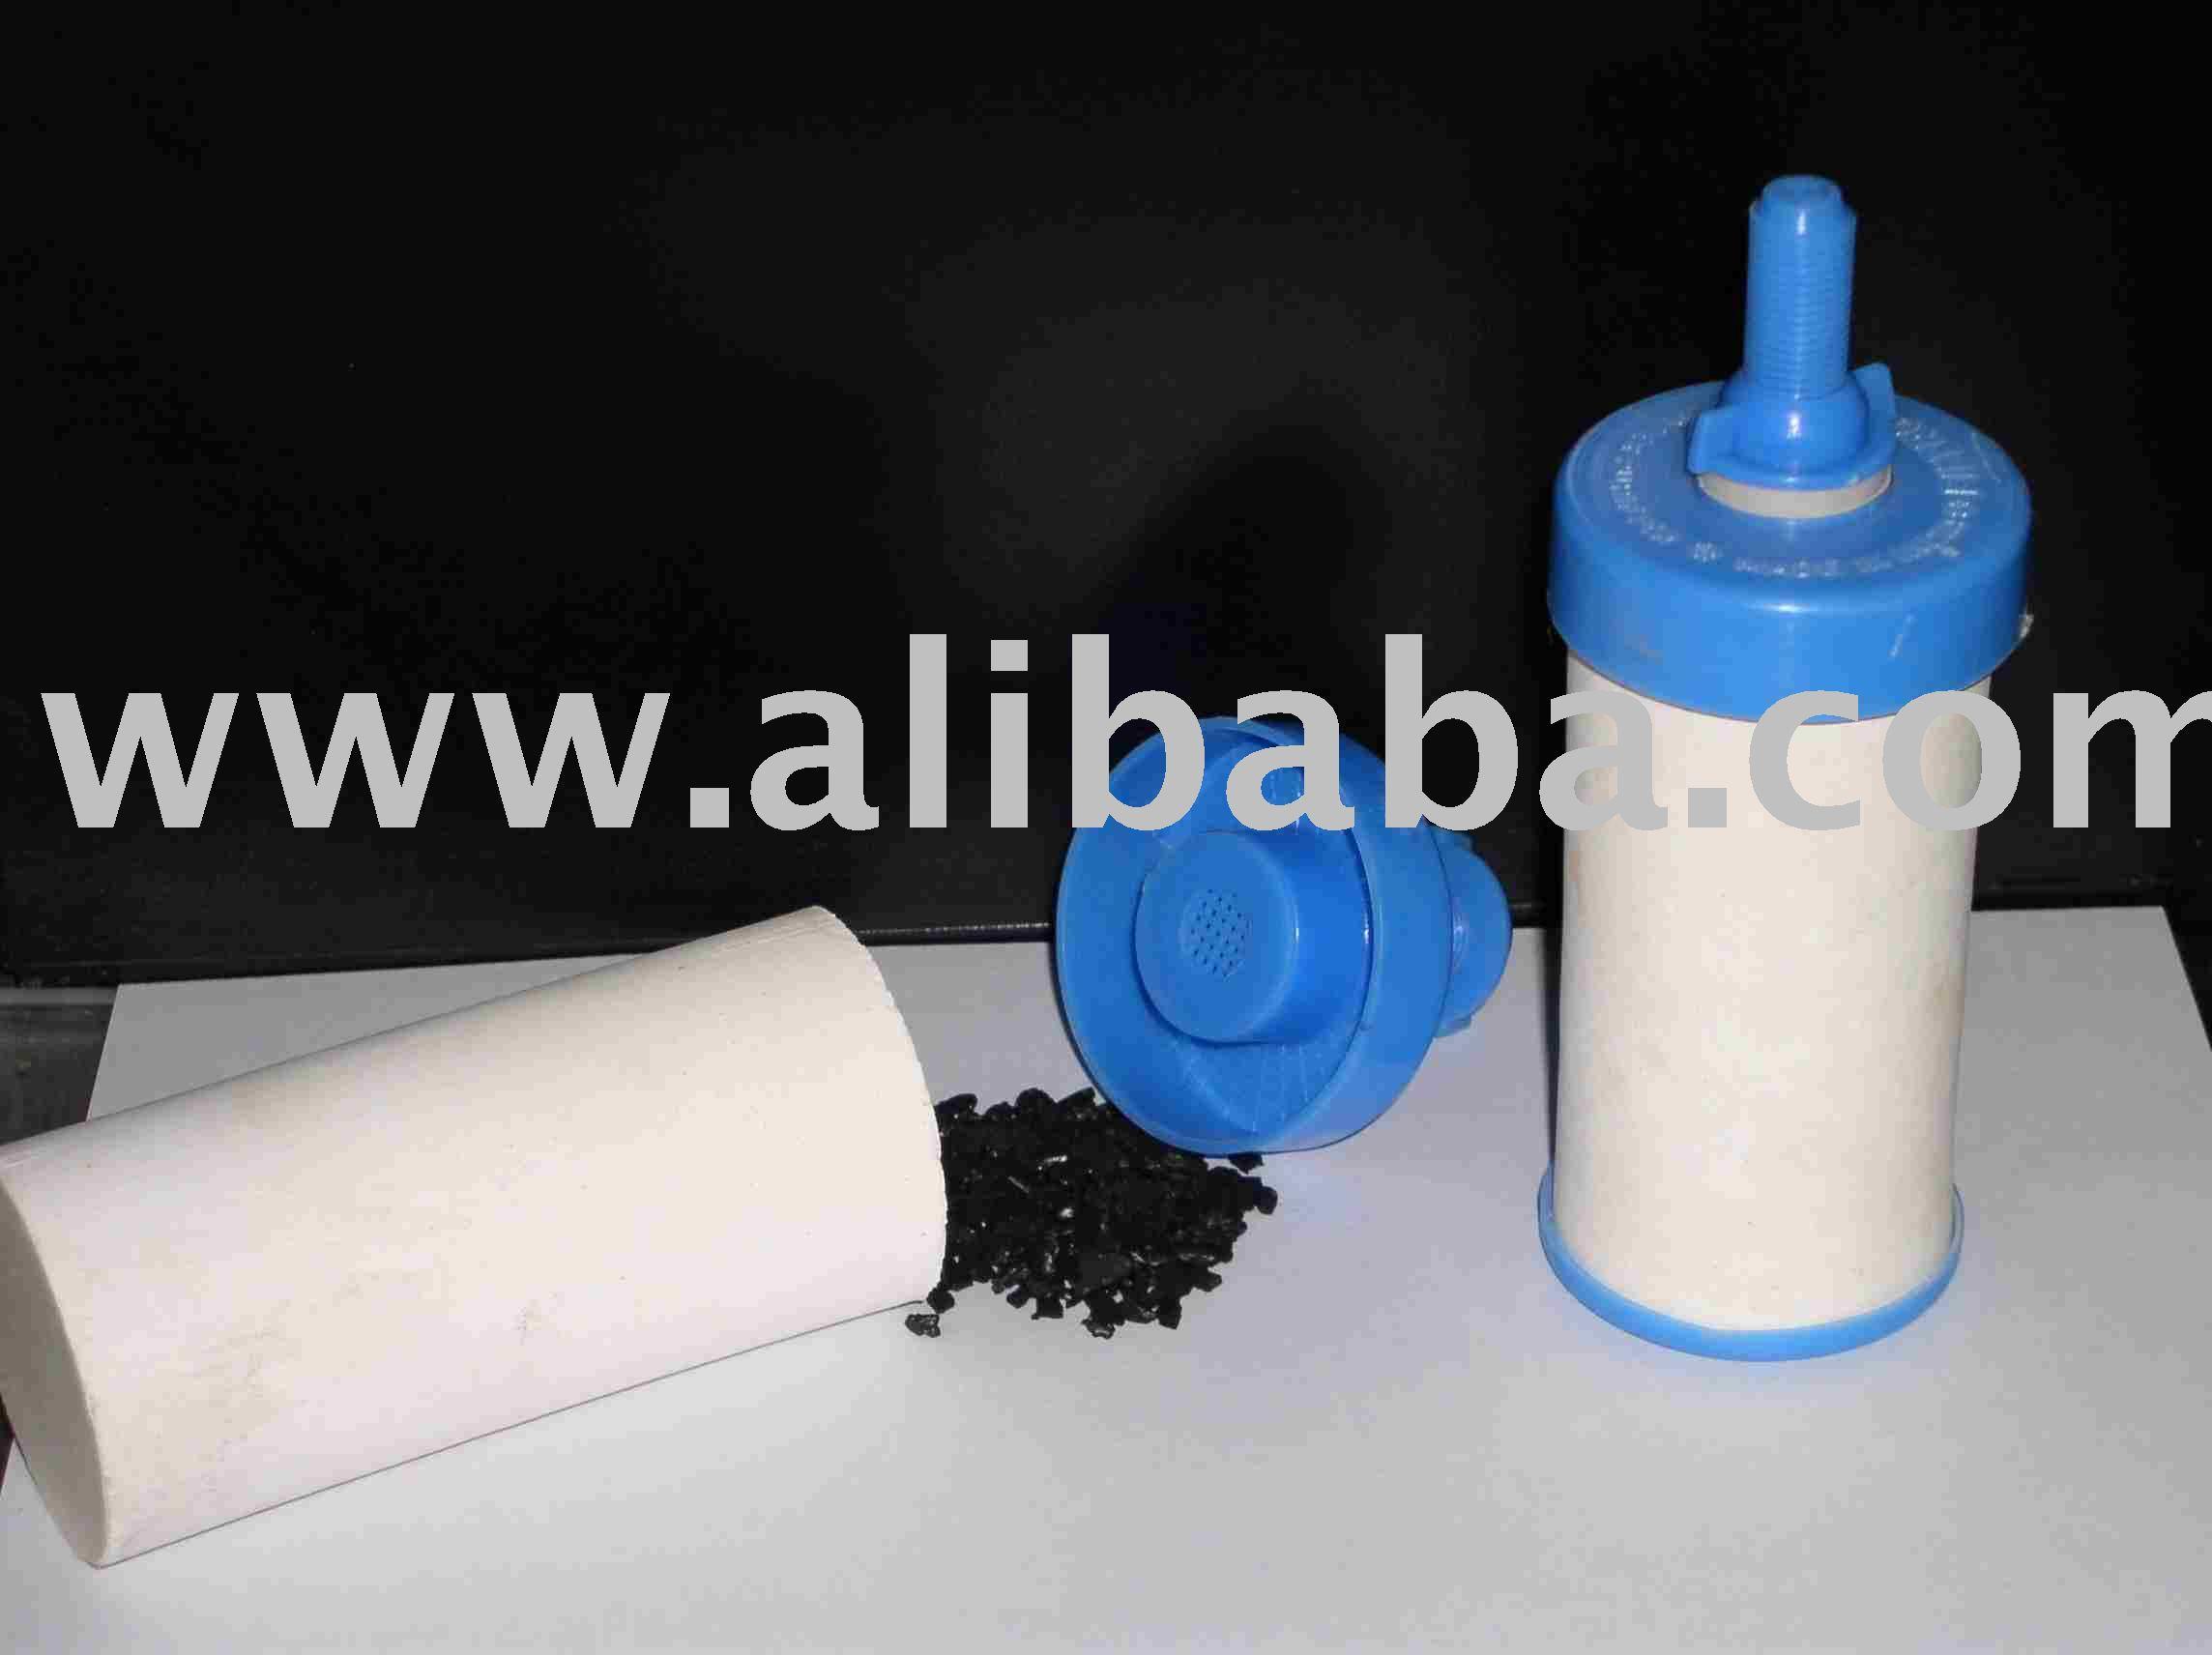 Velas de cer mica del filtro de agua filtros de agua identificaci n del producto 11864479 - Velas de agua ...